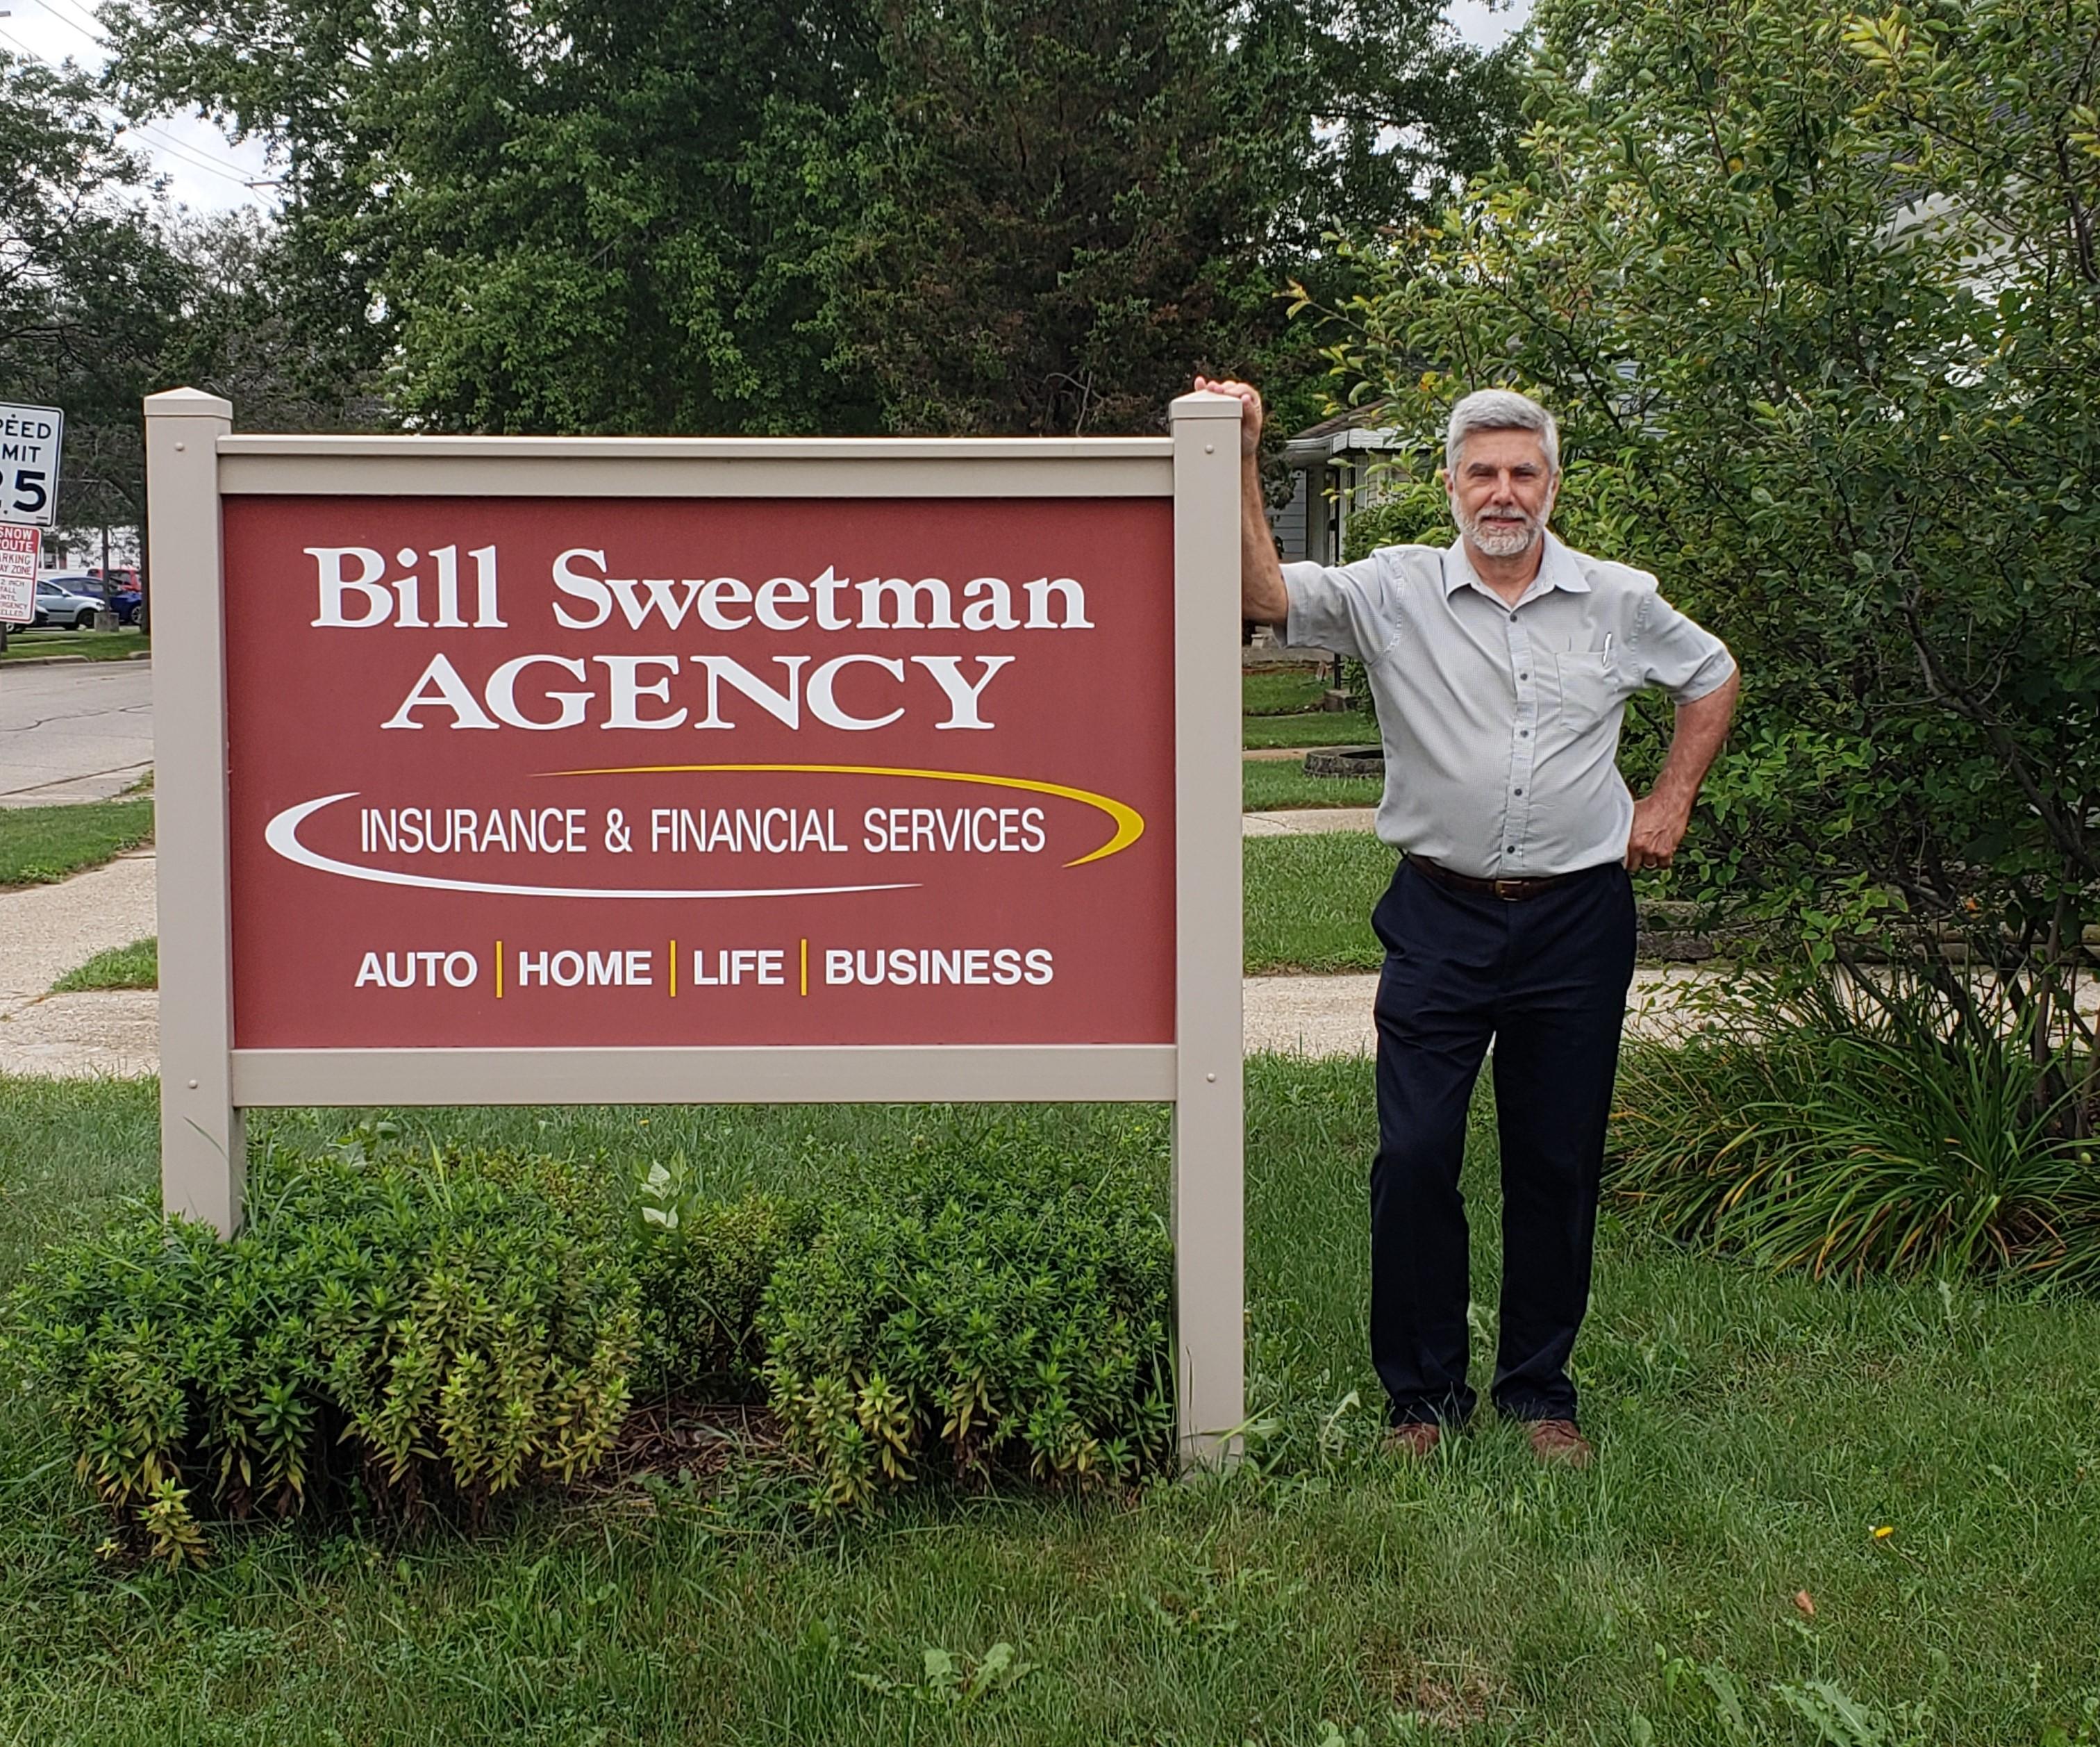 Bill Sweetman Agency Financial Services